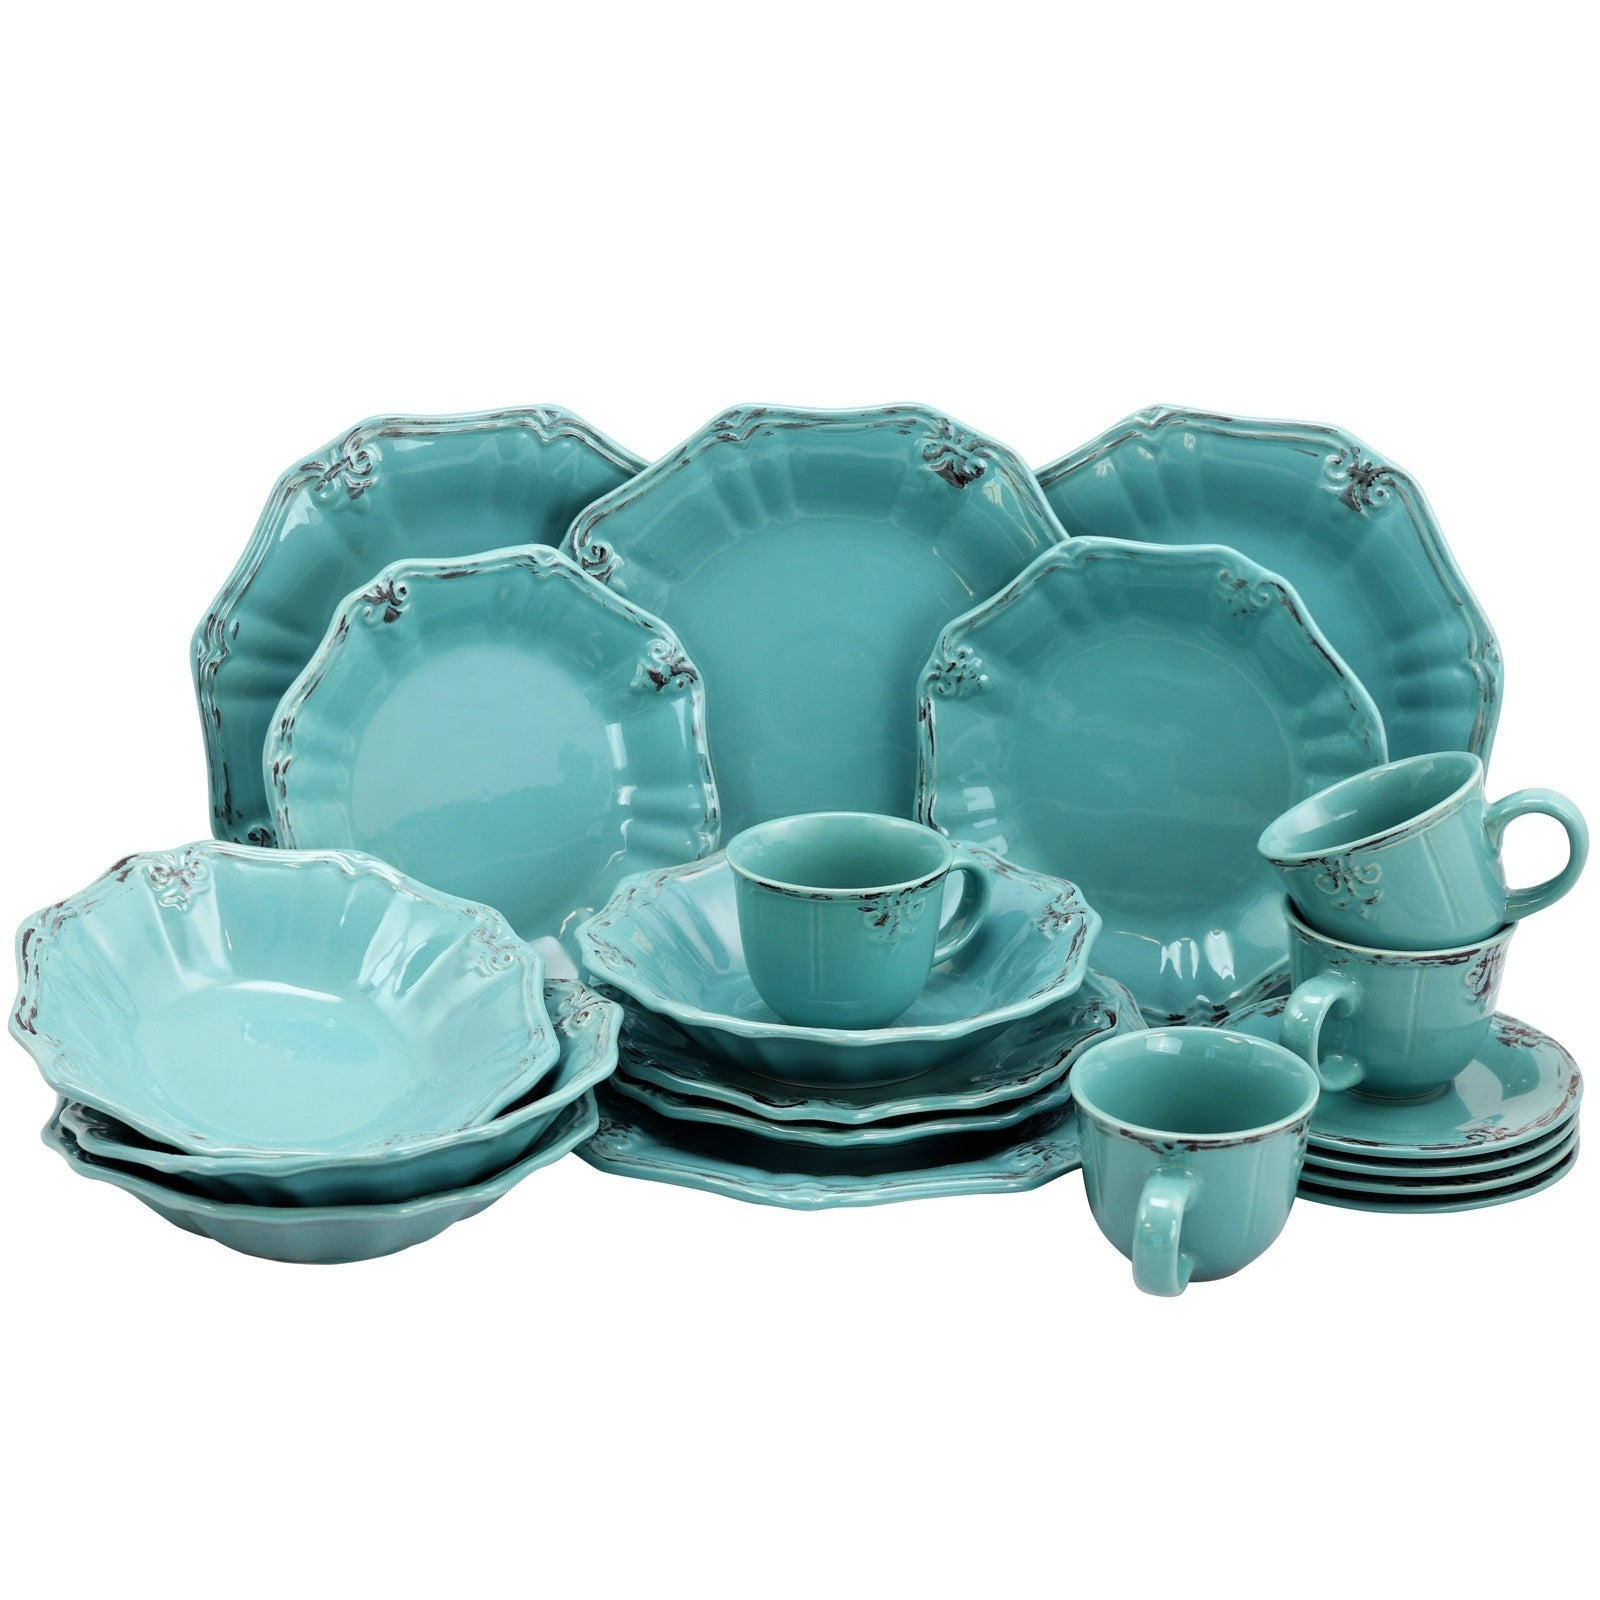 Casual Dinnerware Set Dishwasher-Safe Stoneware Floral Border Turquoise (20-PC)  sc 1 st  eBay & Casual Dinnerware Set Dishwasher-Safe Stoneware Floral Border ...